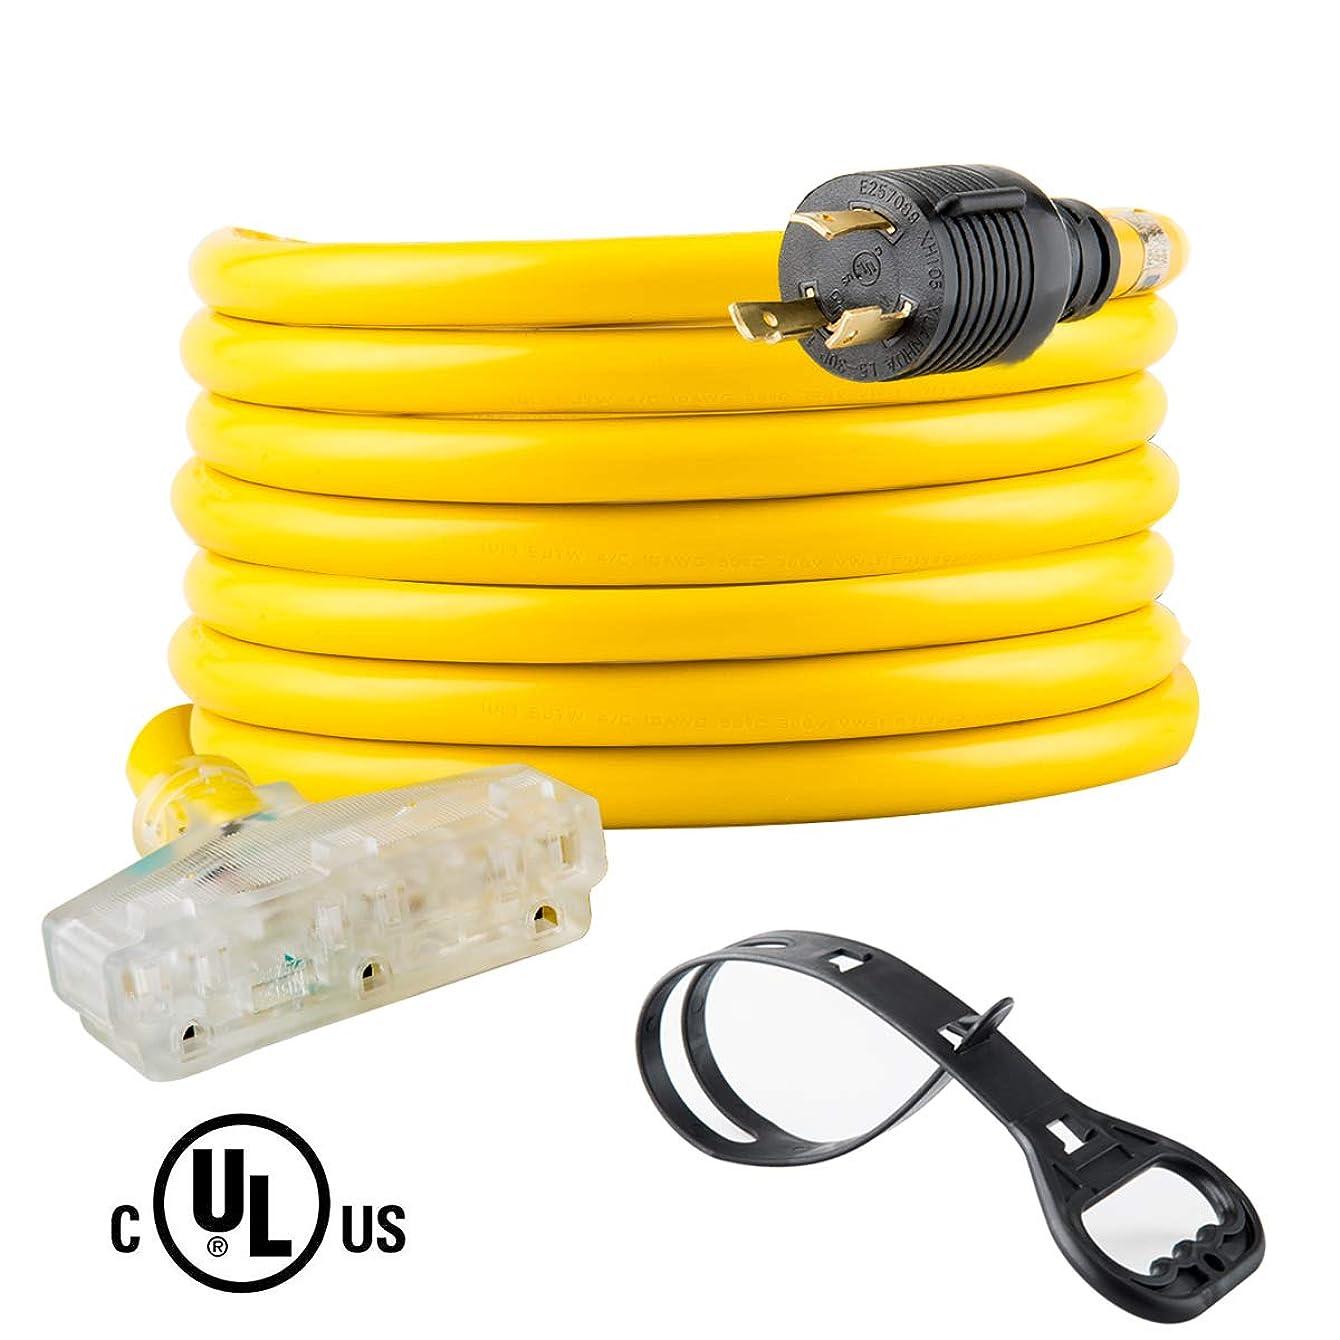 Yodotek 25 Feet Heavy Duty Generator Extension Cord,Generator Locking Cord,NEMA L5-30P/Three 5-15R, 3 Prong 10 Gauge Flexible Generator Cable, Generator Power Cord,30Amp 3750 Watts UL Listed